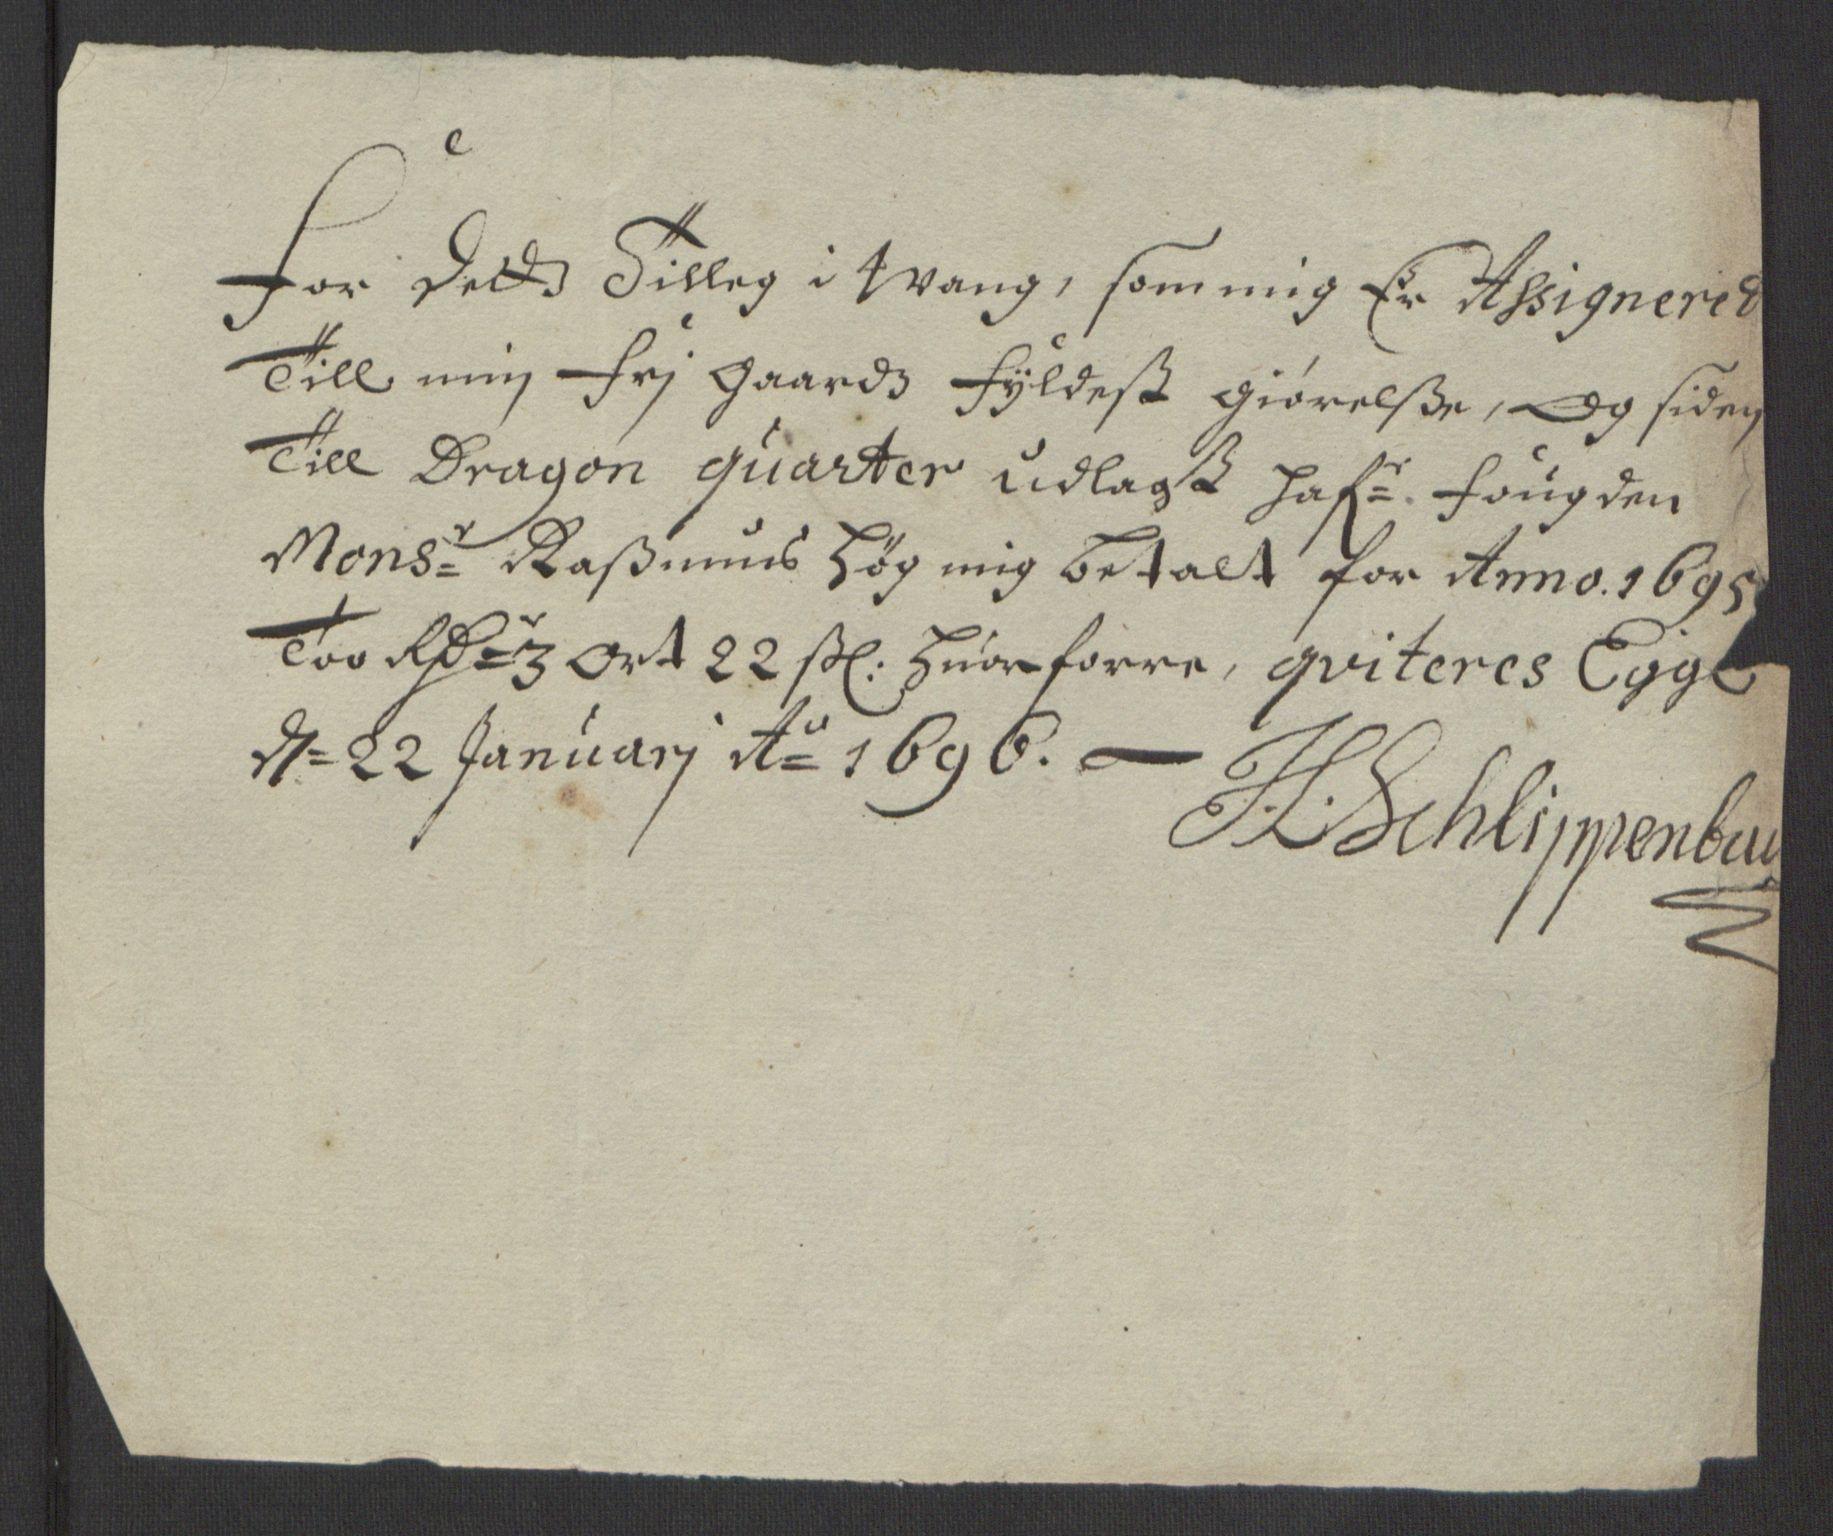 RA, Rentekammeret inntil 1814, Reviderte regnskaper, Fogderegnskap, R63/L4309: Fogderegnskap Inderøy, 1695-1697, s. 94